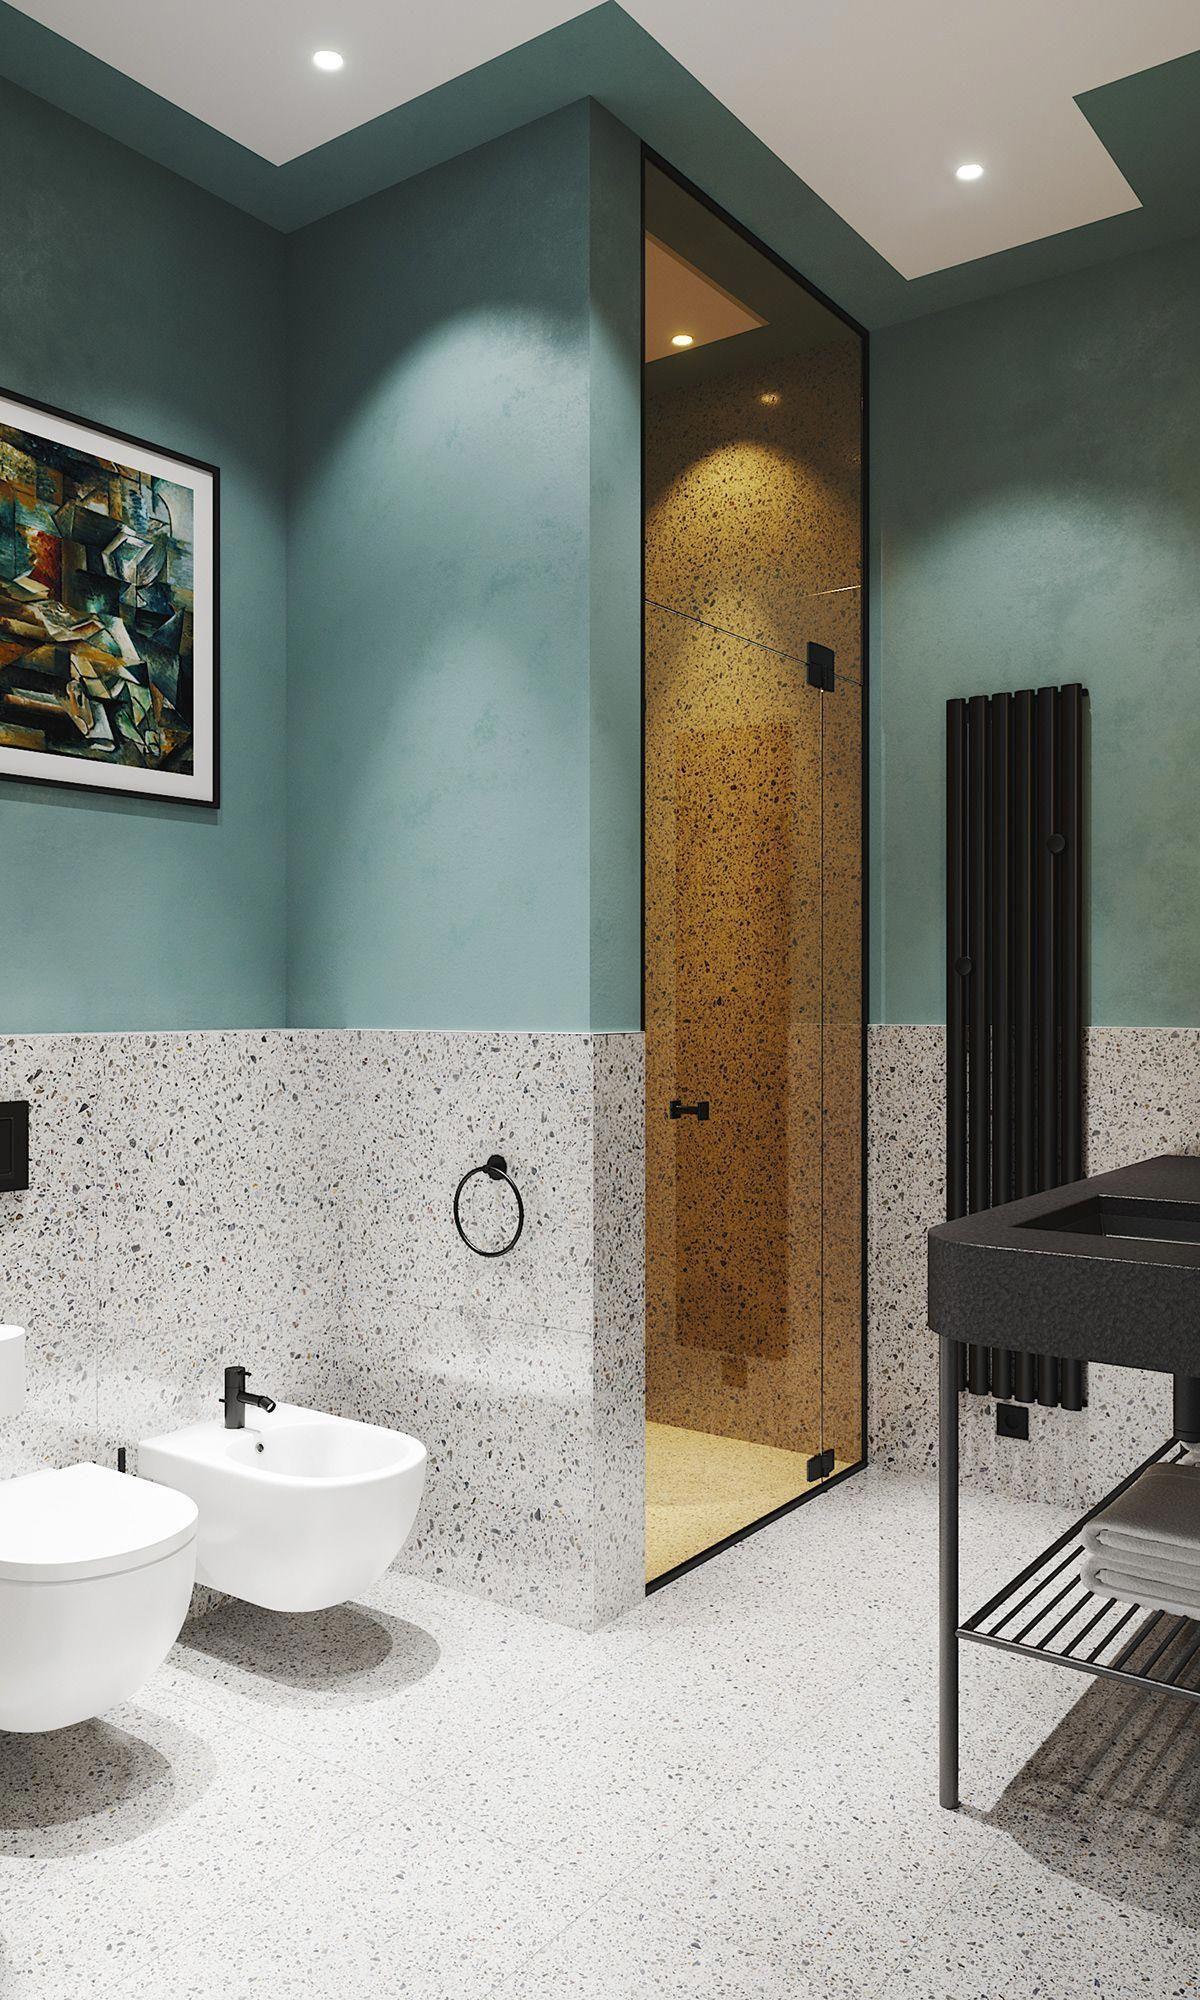 Contemporary Bathroom Design Ideas Every Bathroom Remodel Begins With A Design Conc Contemporary Bathroom Designs Modern Bathroom Design Bathroom Design Small Latest full bathroom wall